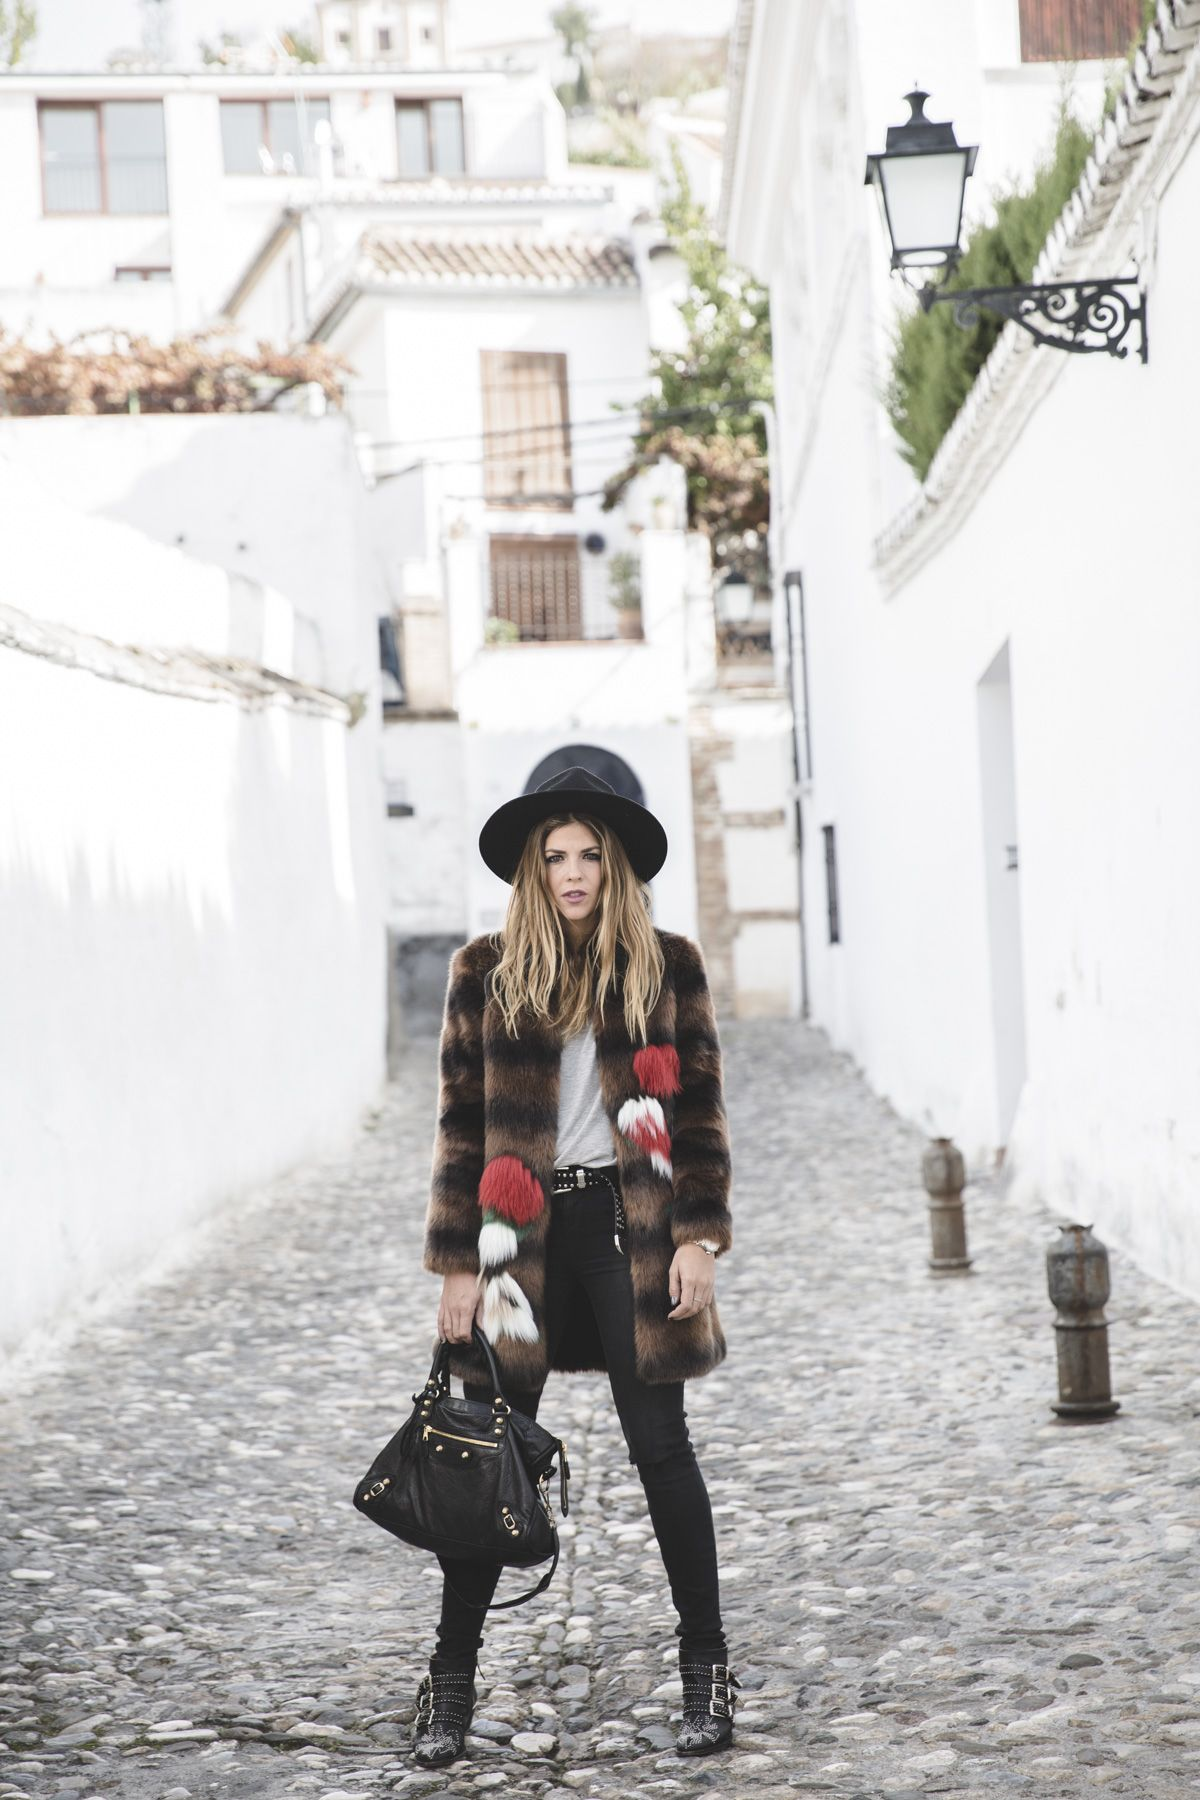 Trendy Taste – Albaicín. Grey tee+black denim+black ankle boots with metallic details+brown fur coat with colour details+black handbag+black and silver belt+black hat. Fall Outfit 2016